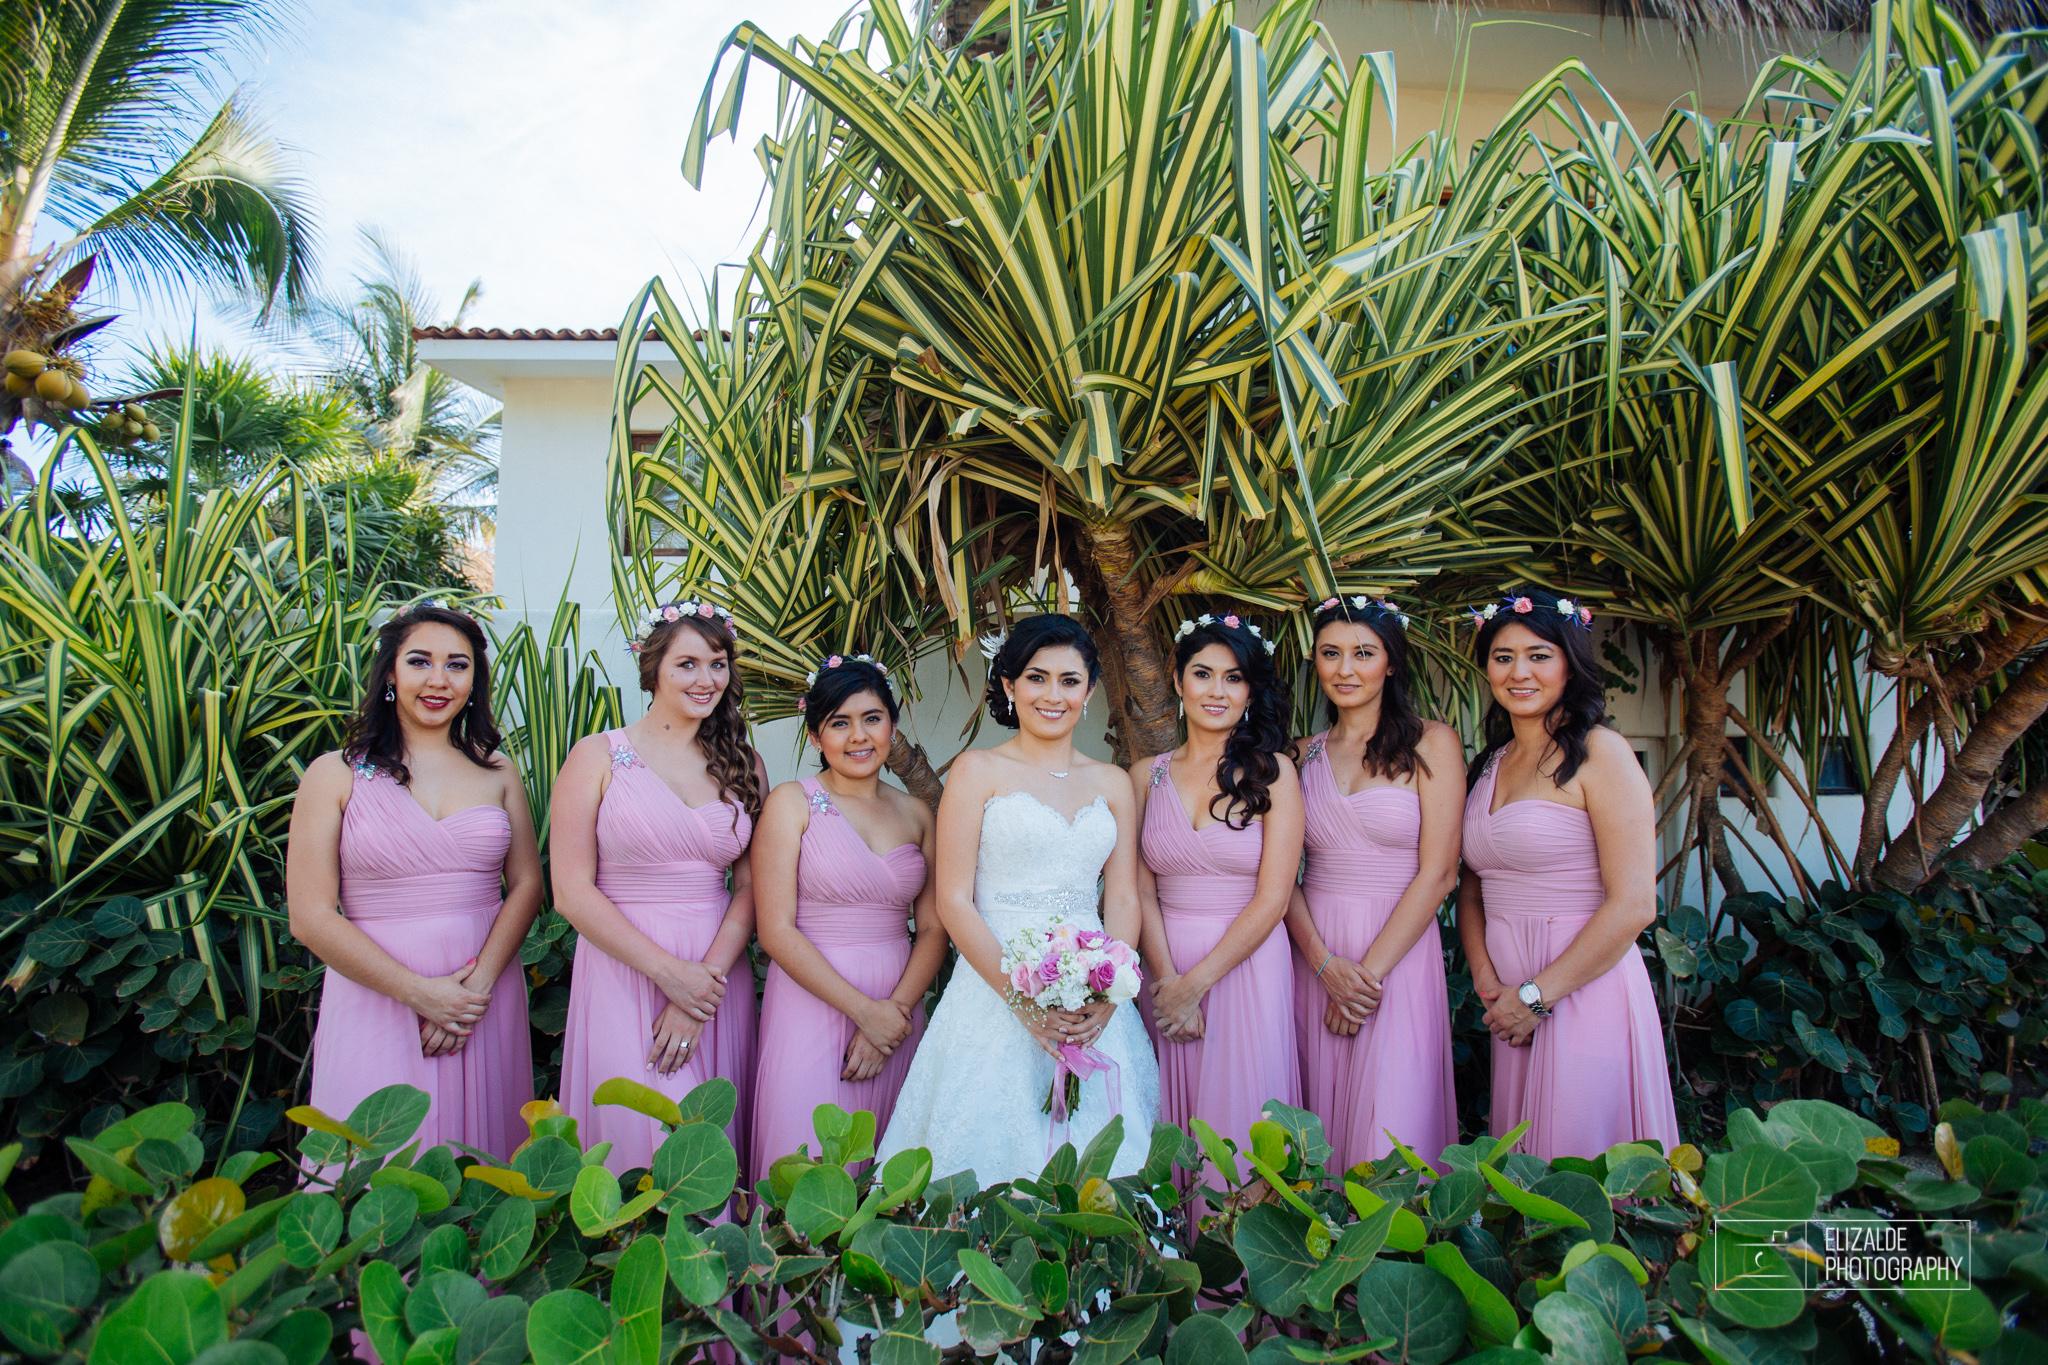 Pay and Ferran_Acapulco_Destination Wedding_Elizalde Photography-53.jpg